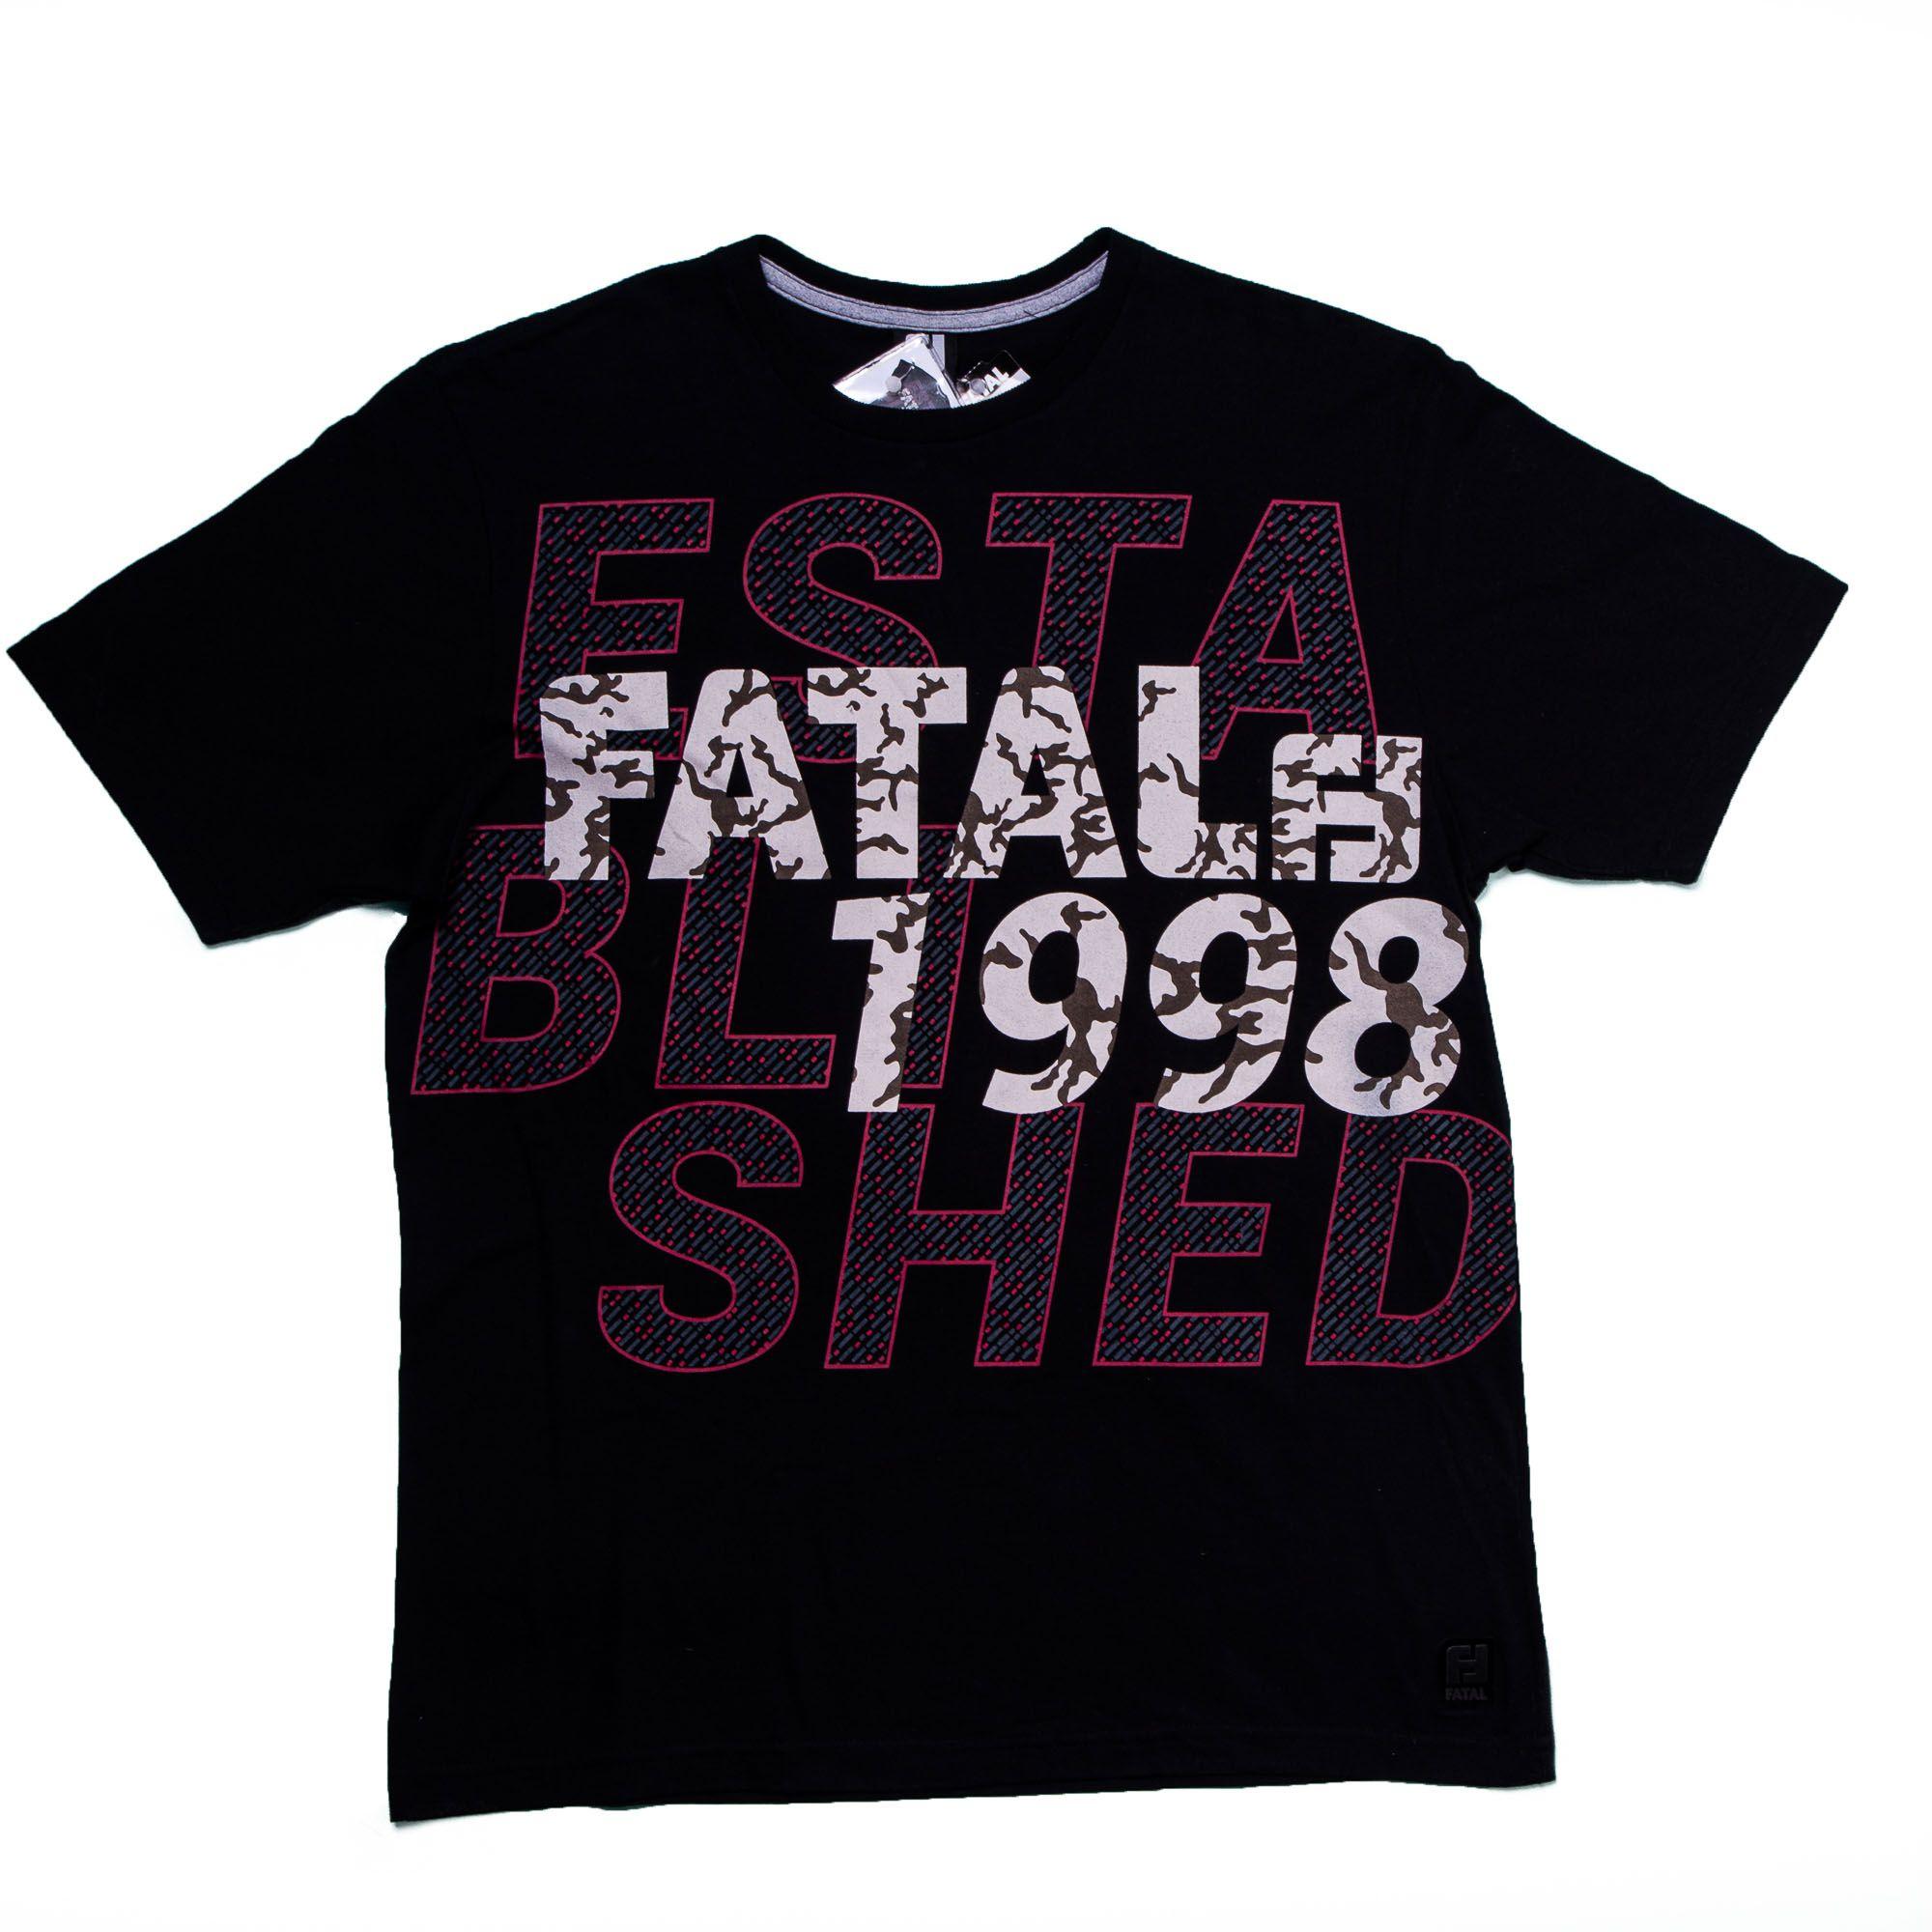 Camiseta Masculina Manga Curta Estampa Total Efeito Camurça - Fatal